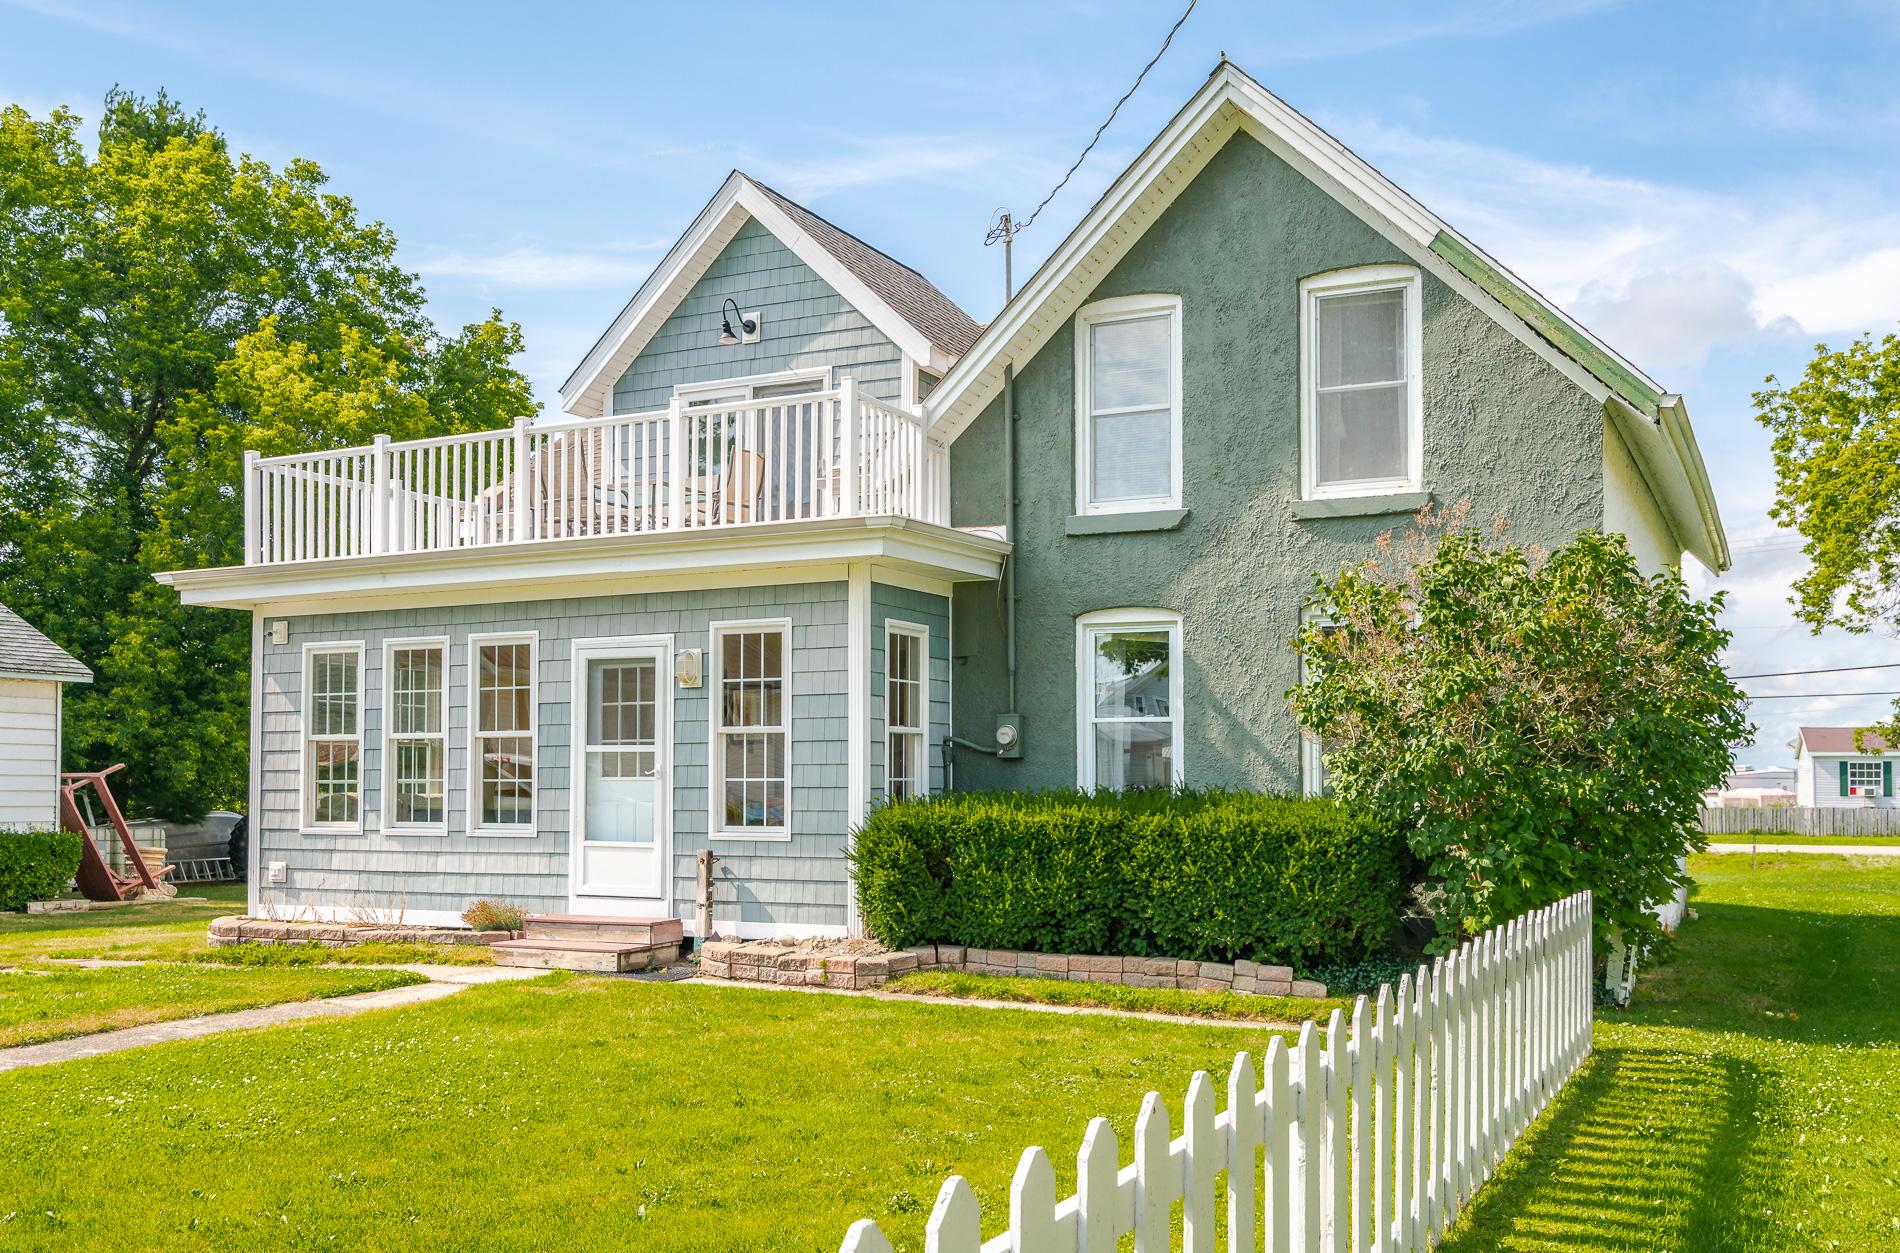 10 BDRM BEACH HOUSE!